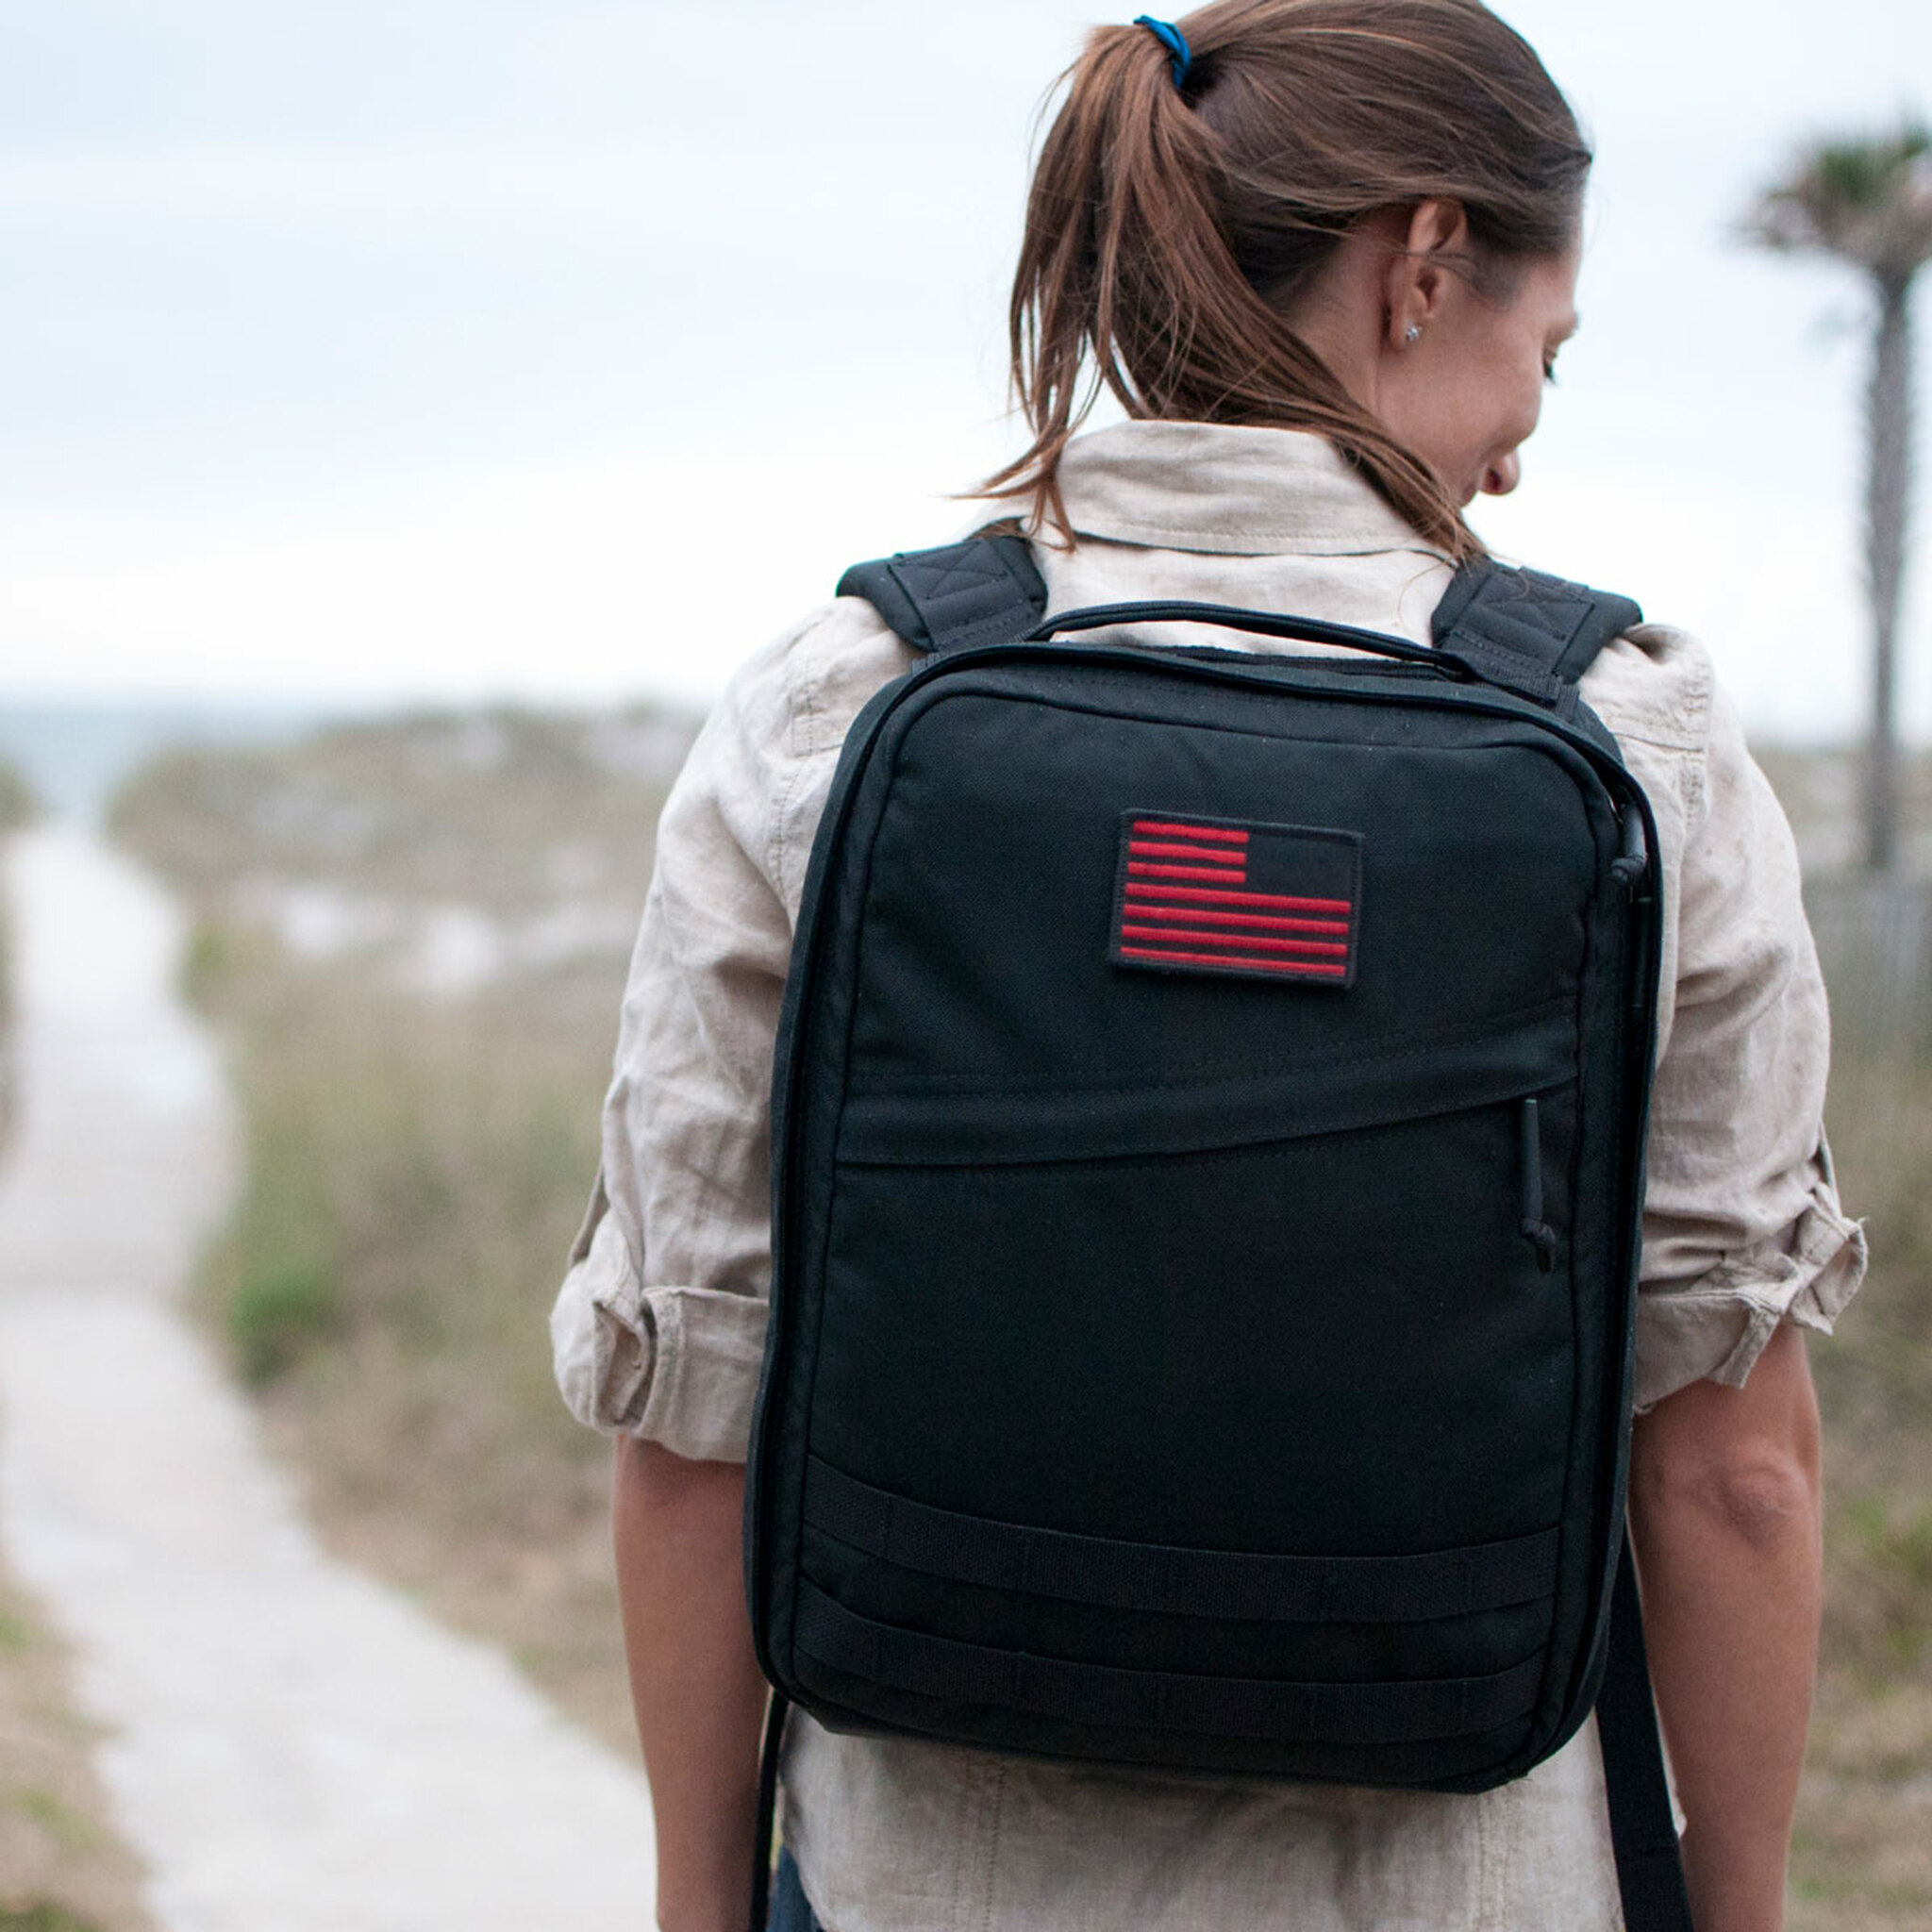 046586cacada8 Echo Rucksack - Best Small Tactical Backpack